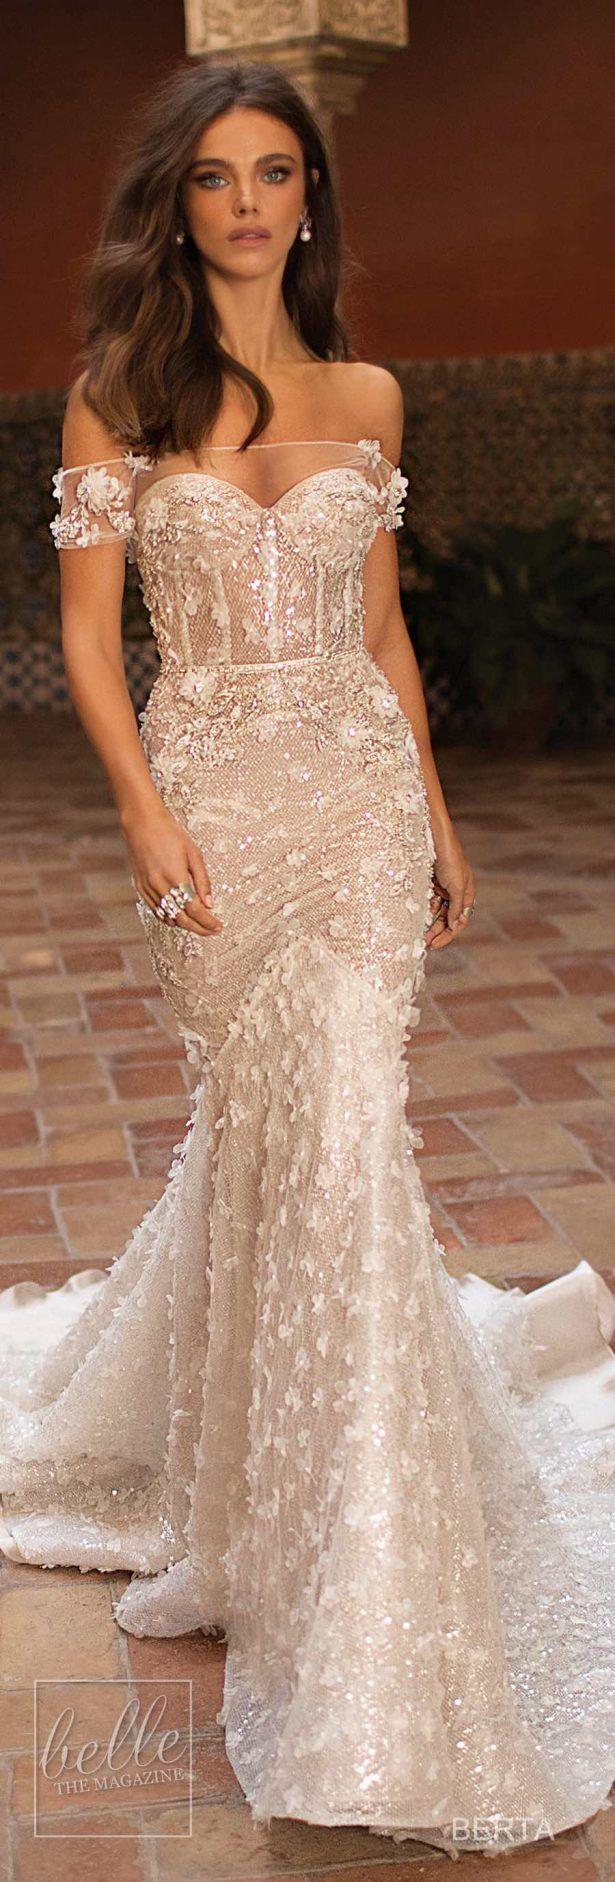 Valentino spring couture miss millionairess u co pinterest